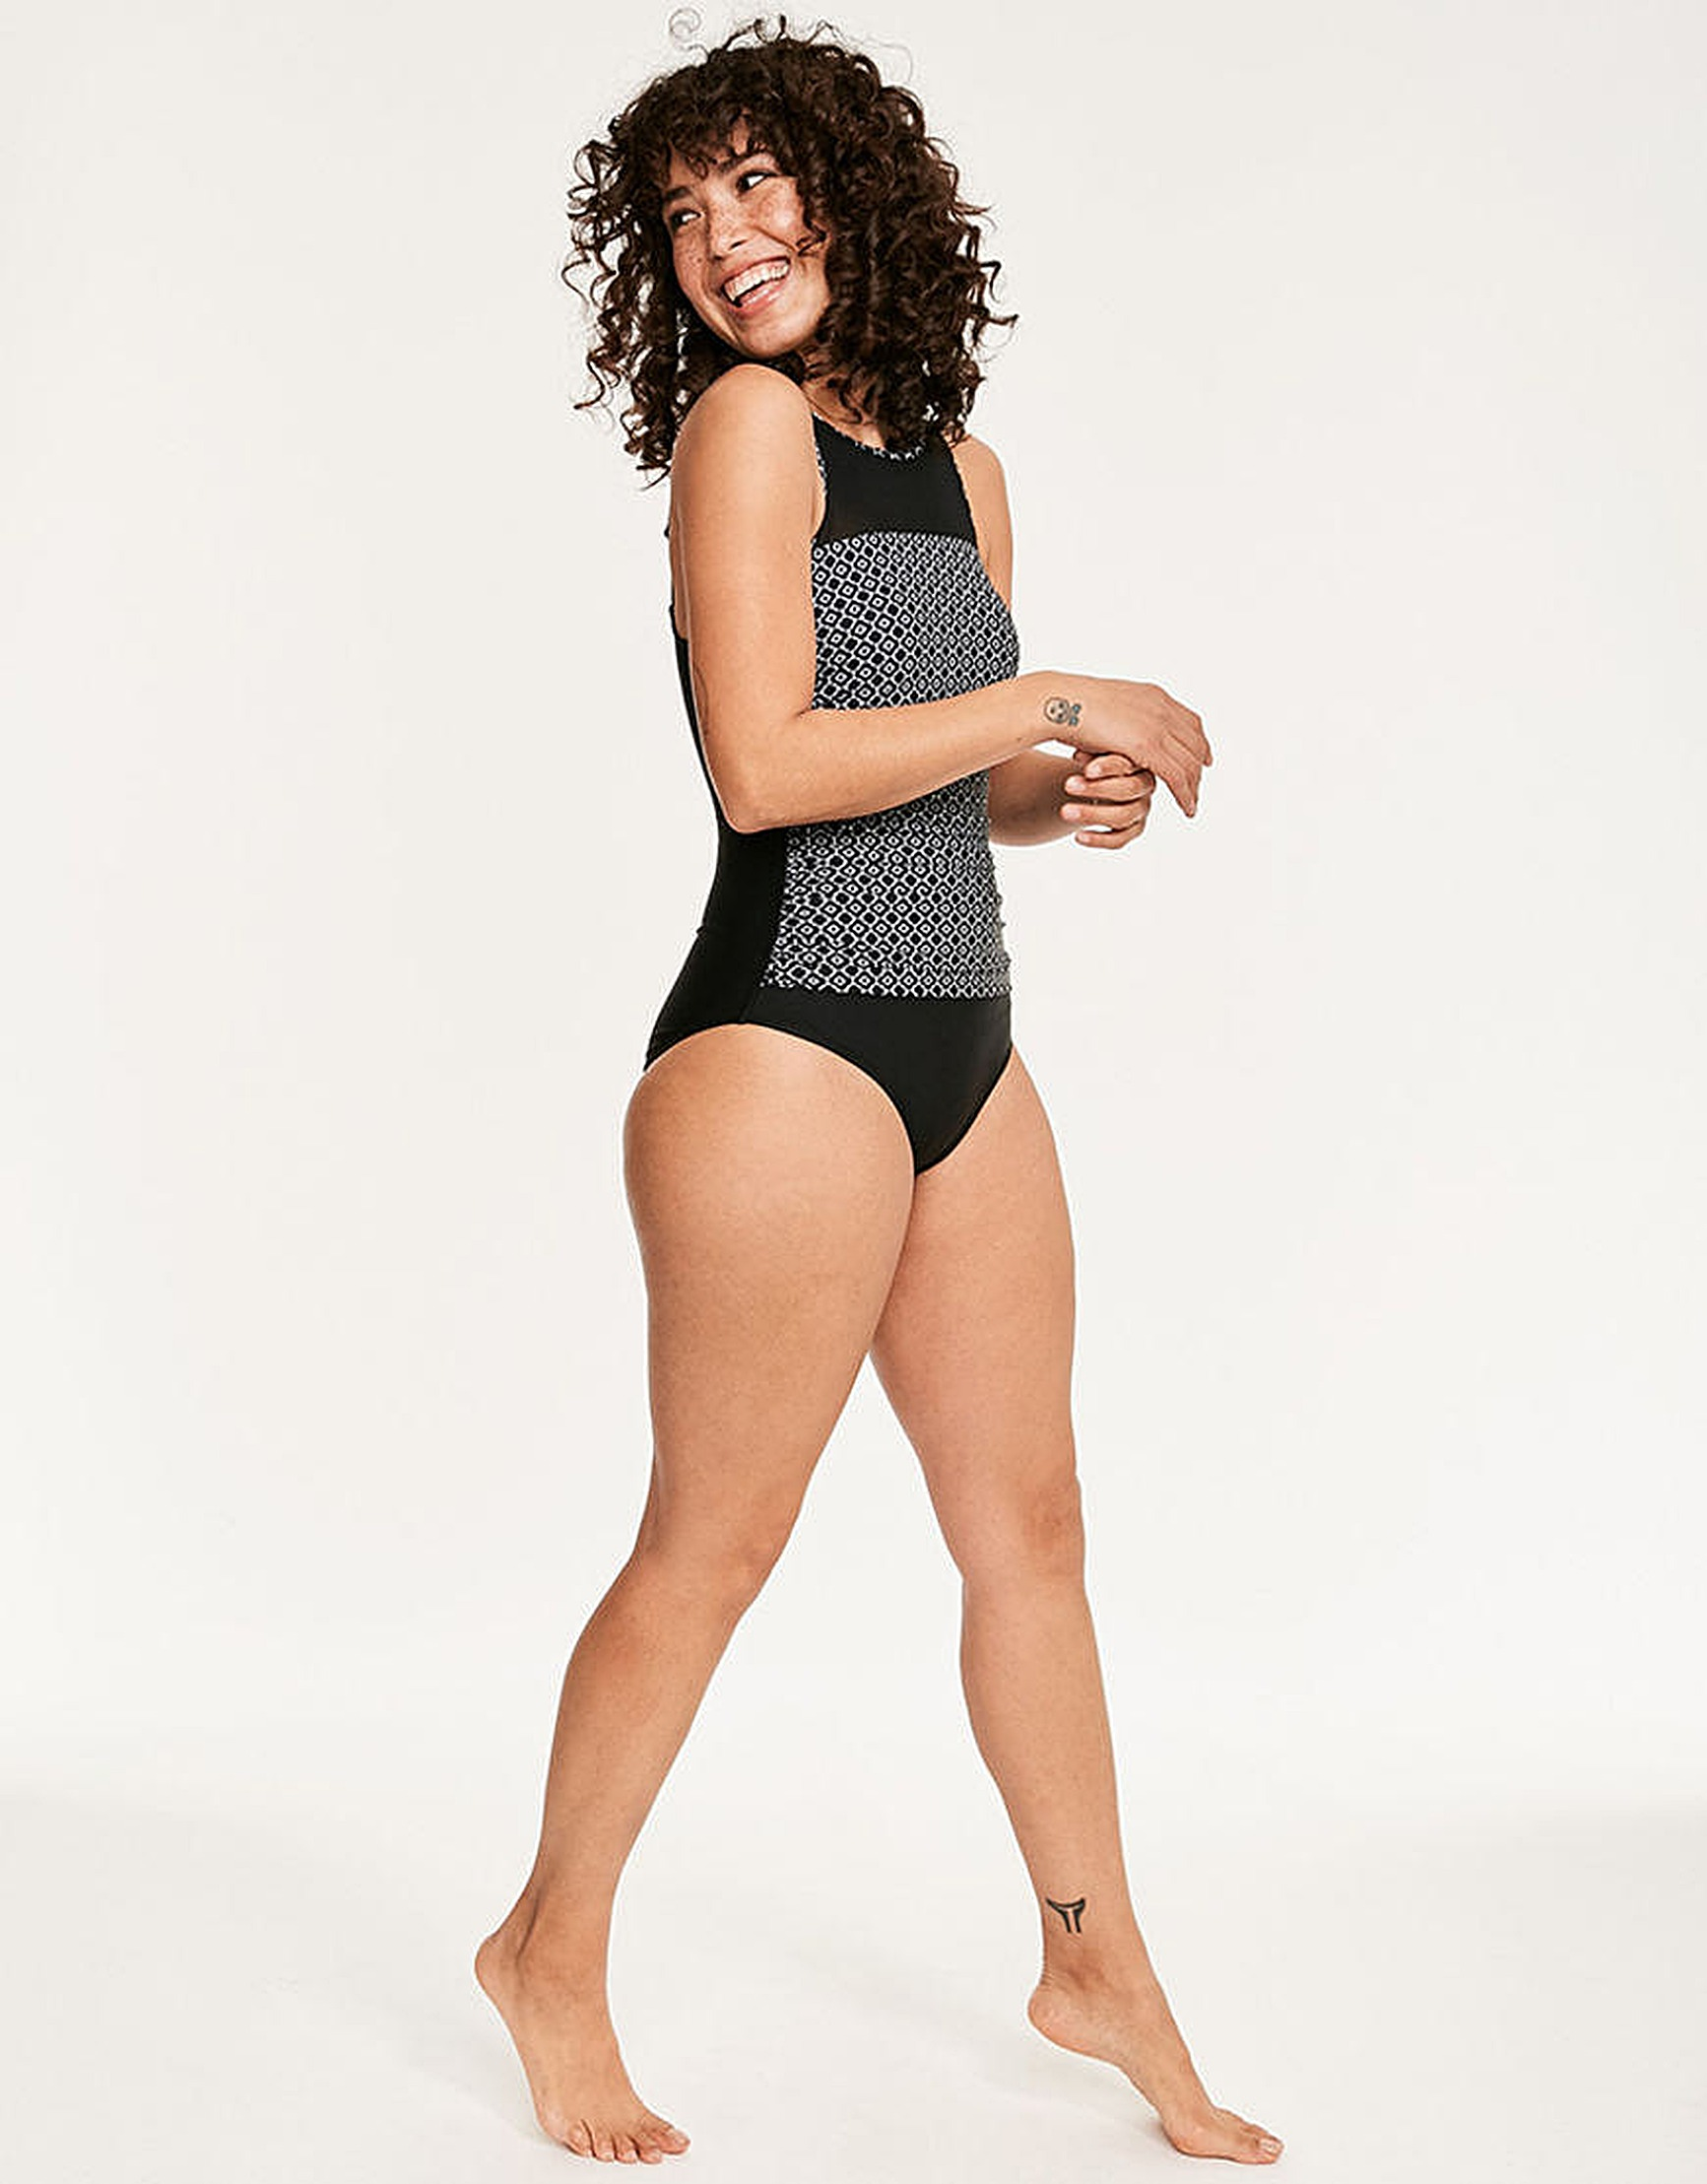 a9f1ac1cf1f91 Amoena Ayon Mastectomy Swimsuit